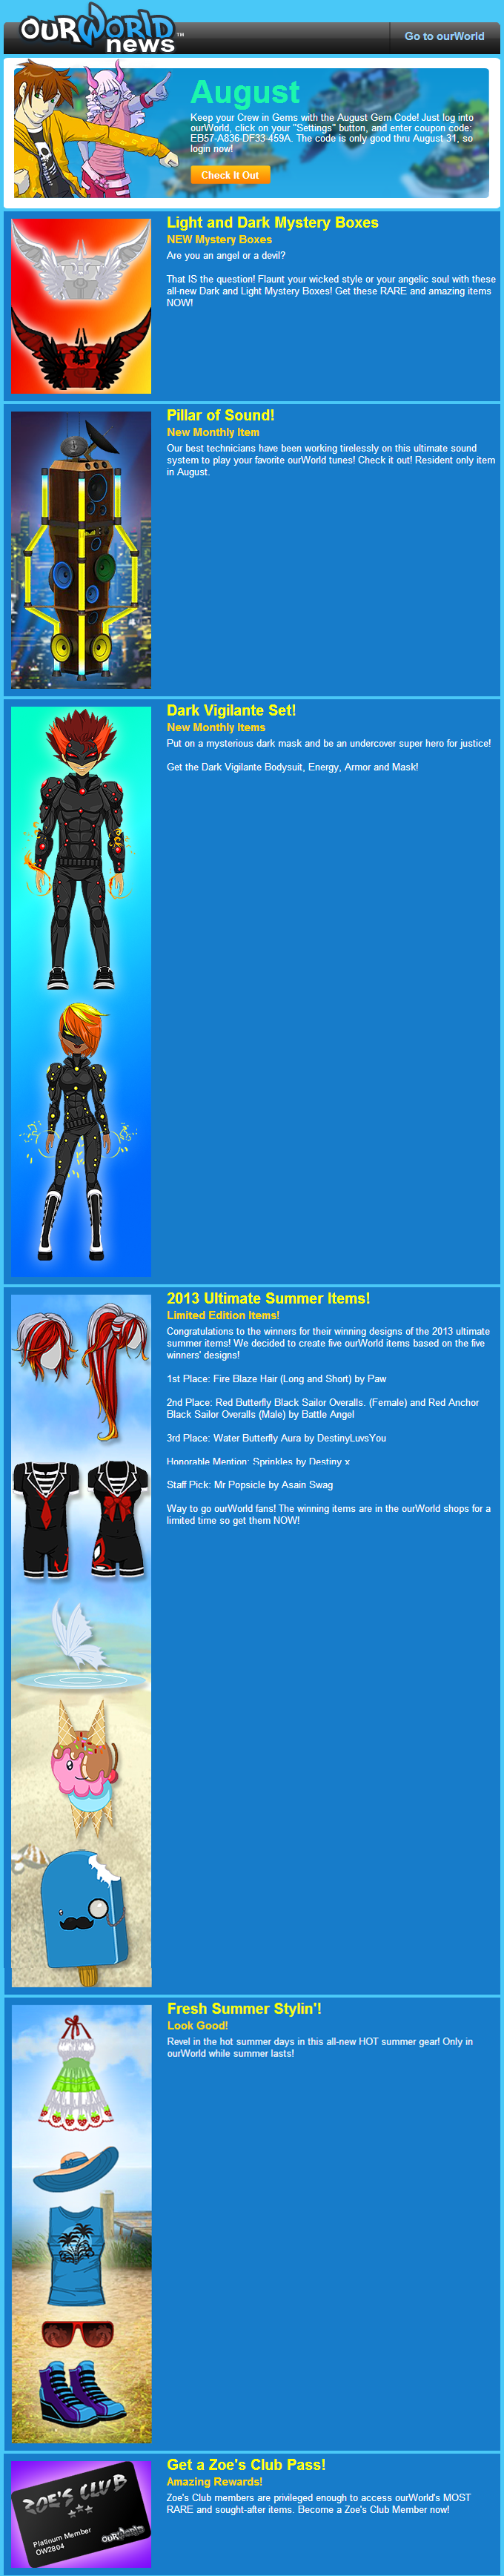 word 2013 newsletter